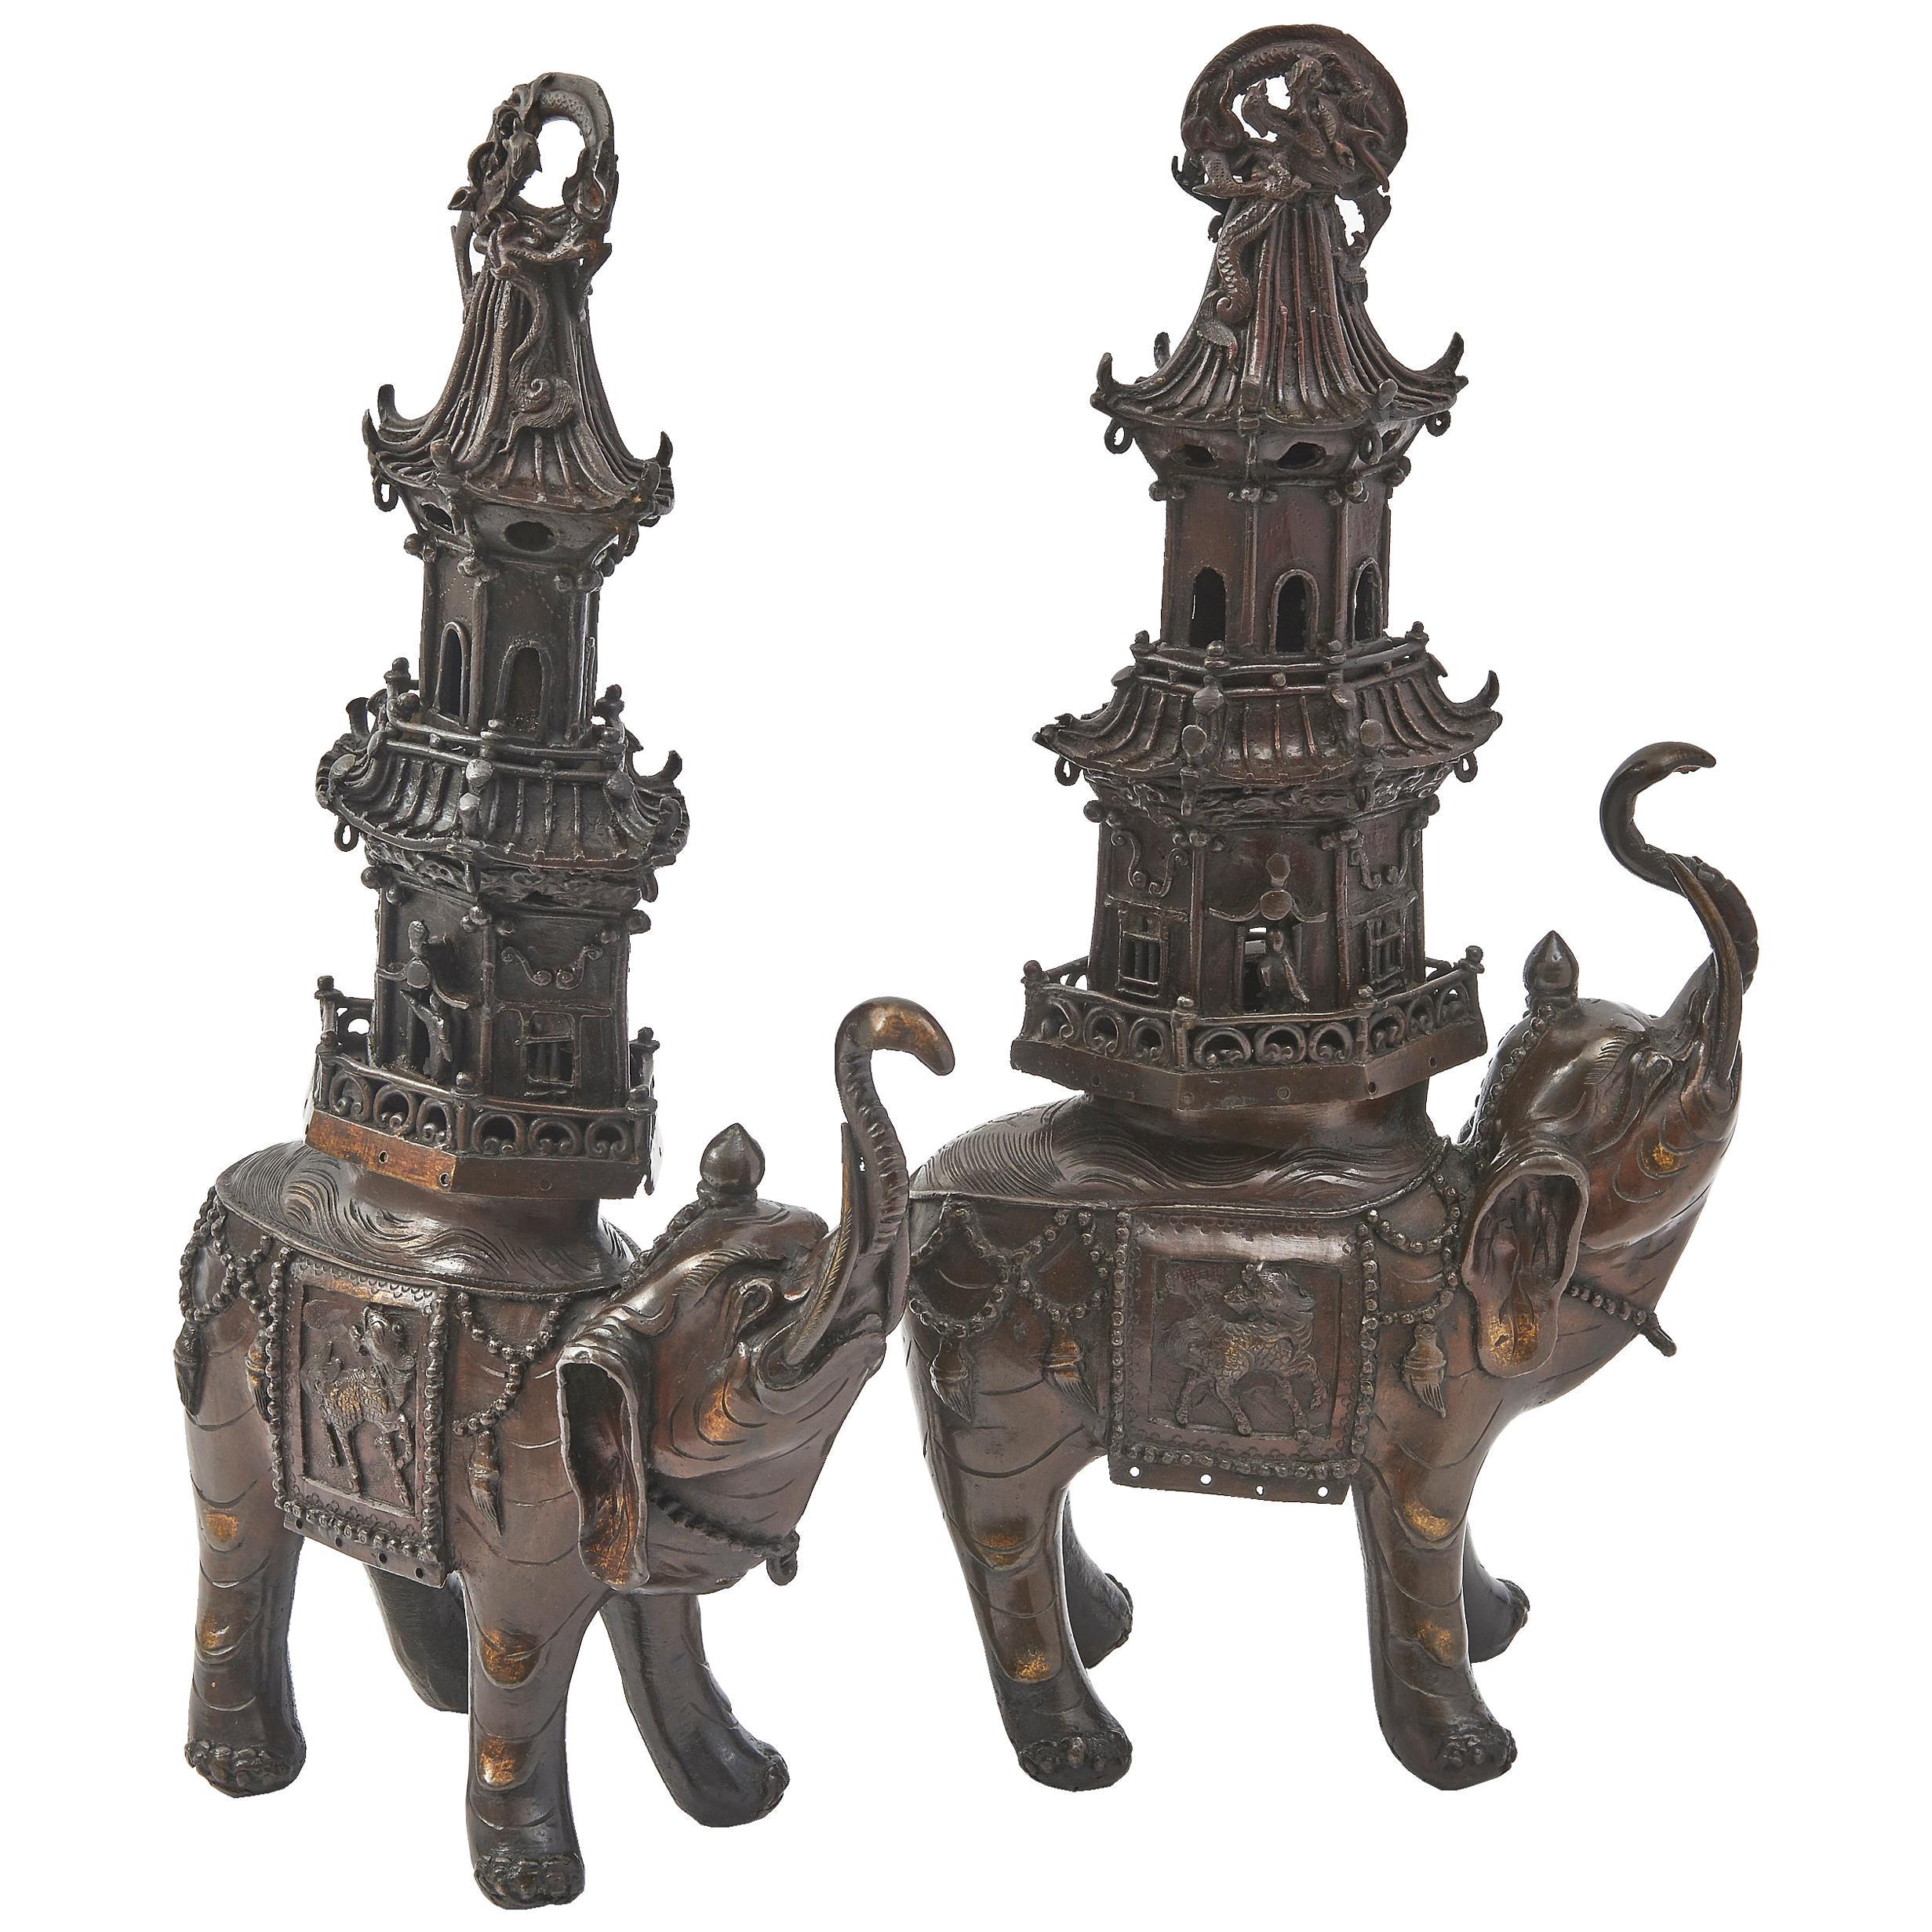 Japanese Bronze Elephant Incense Burners, circa 1890